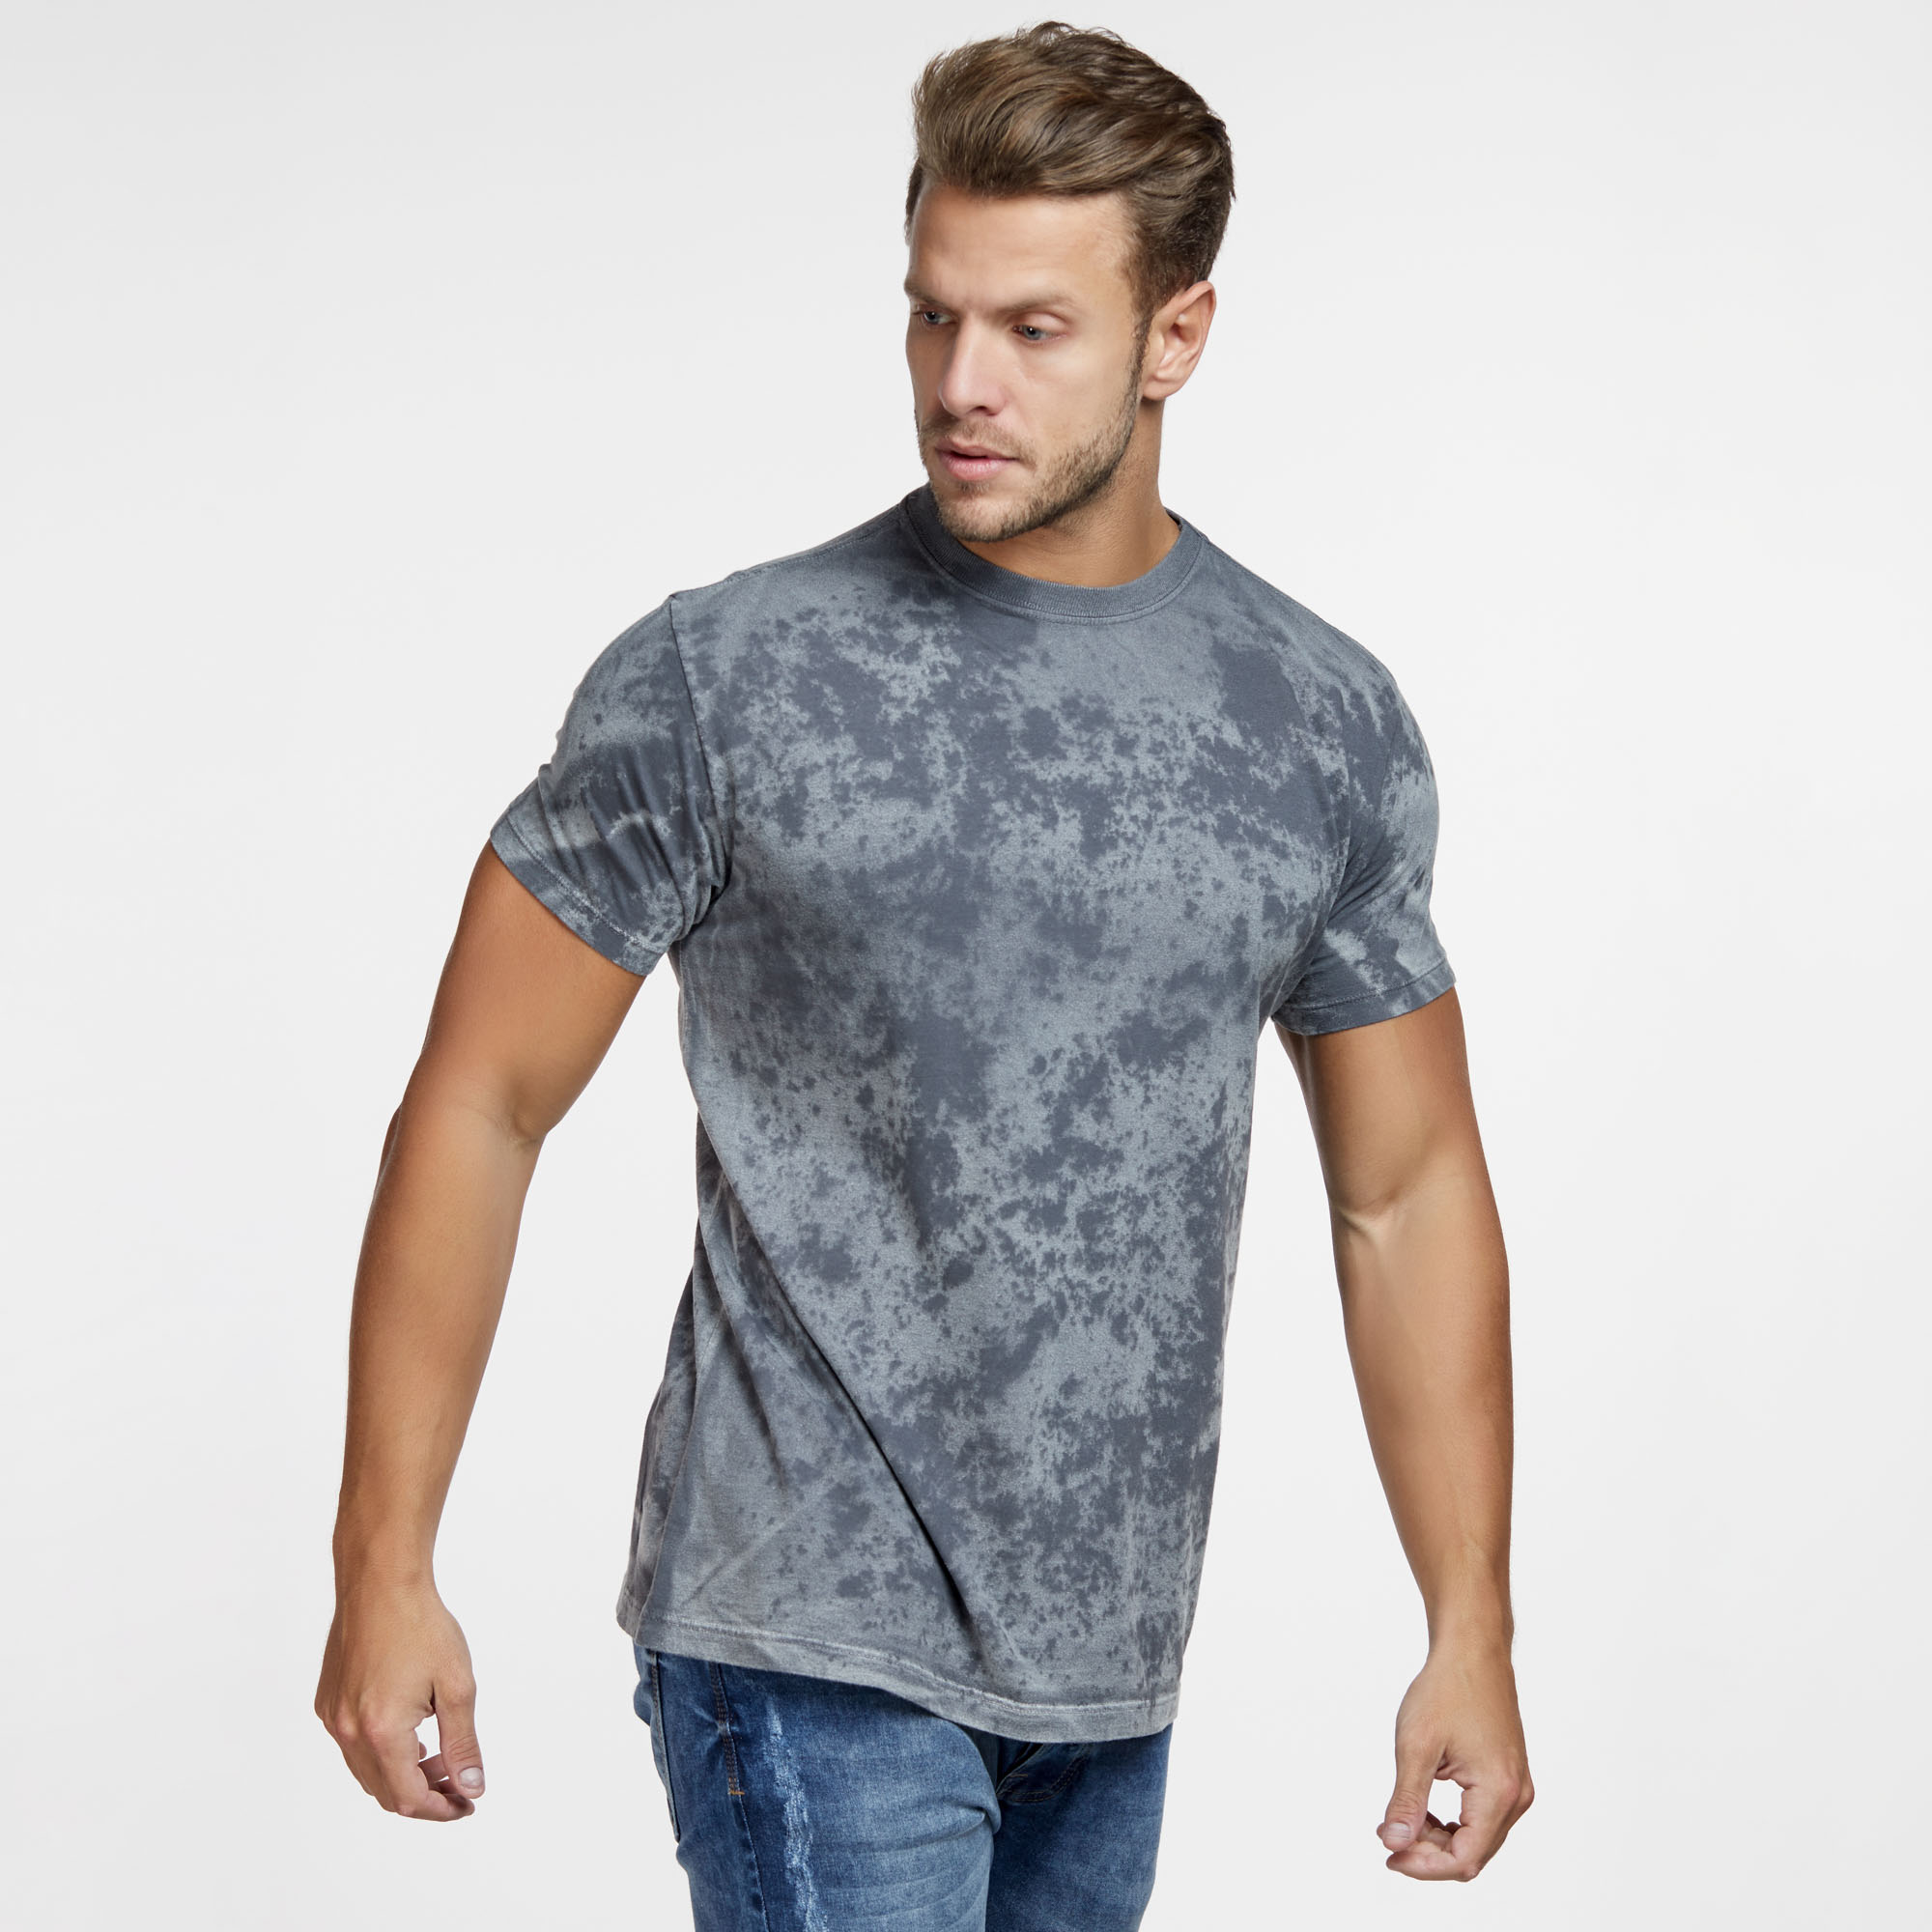 Camiseta Masculina Texturizada Cinza